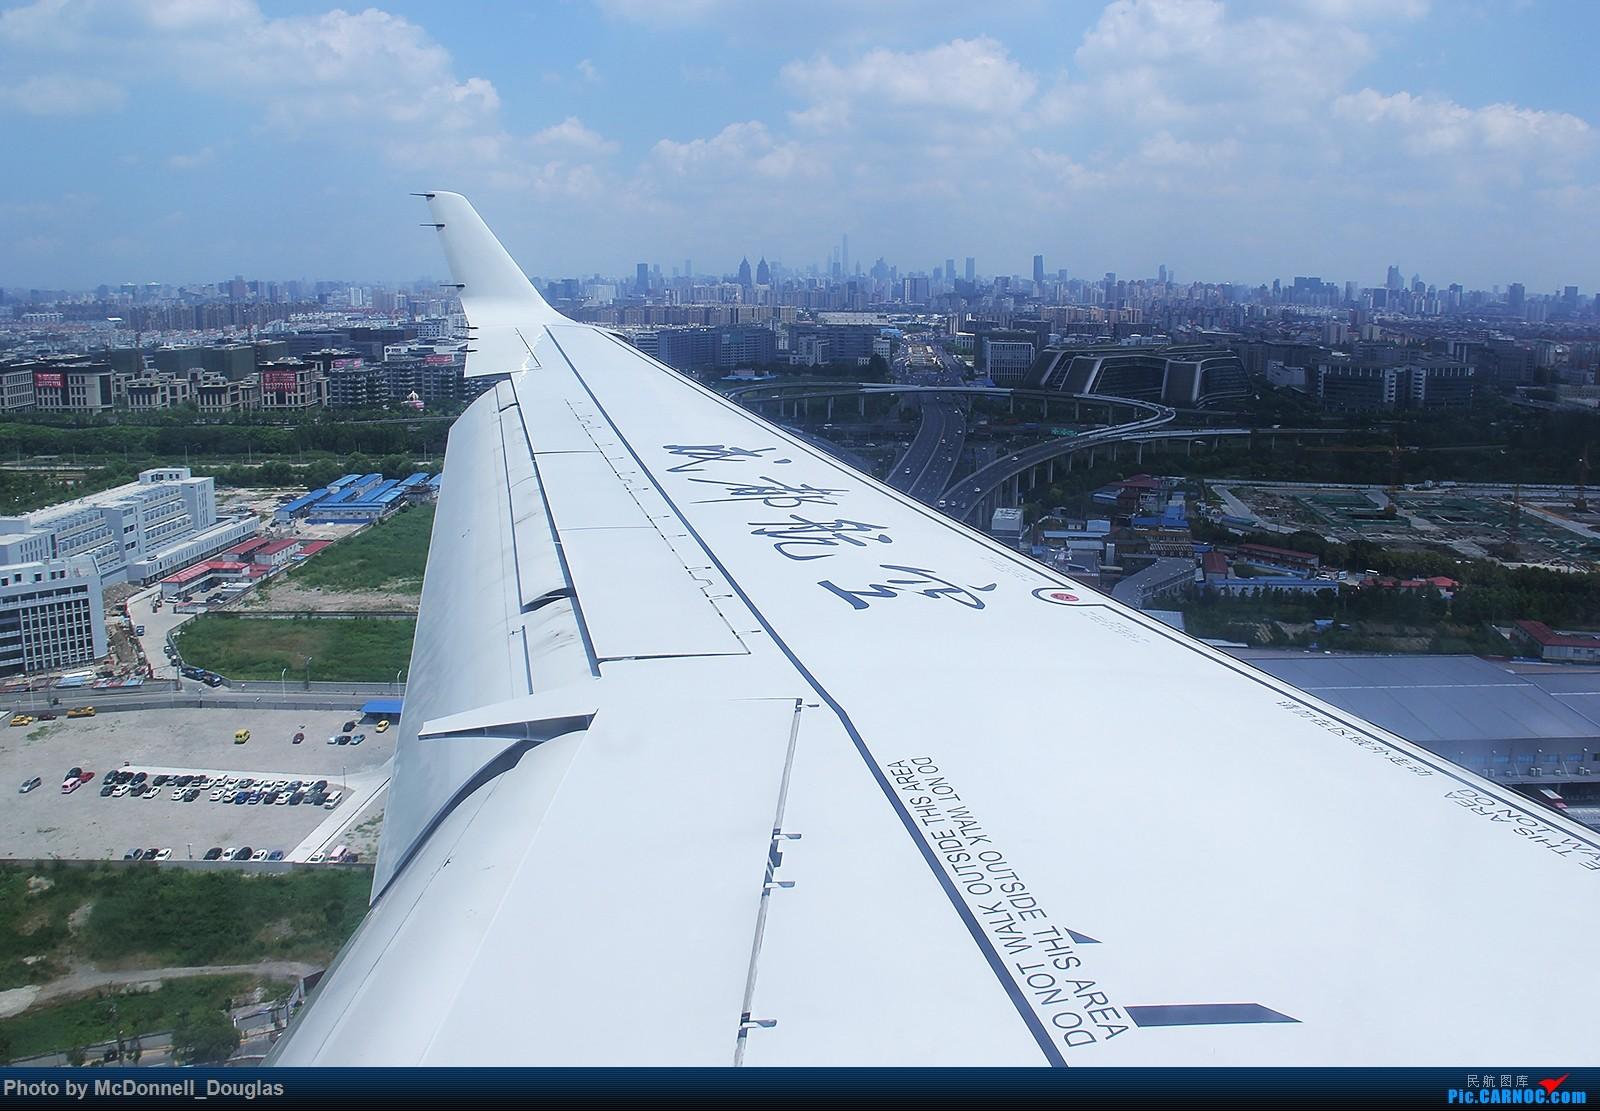 Re:[原创]【上海飞友会】【zc带你走天下(3)】再访祖辈年轻时工作的土地,父母年少时生活戈壁,跨越大半个中国去看新疆,回程小游蓉城(下)【已更至ARJ21详尽评测 COMAC ARJ21-700 B-3321 中国上海虹桥国际机场